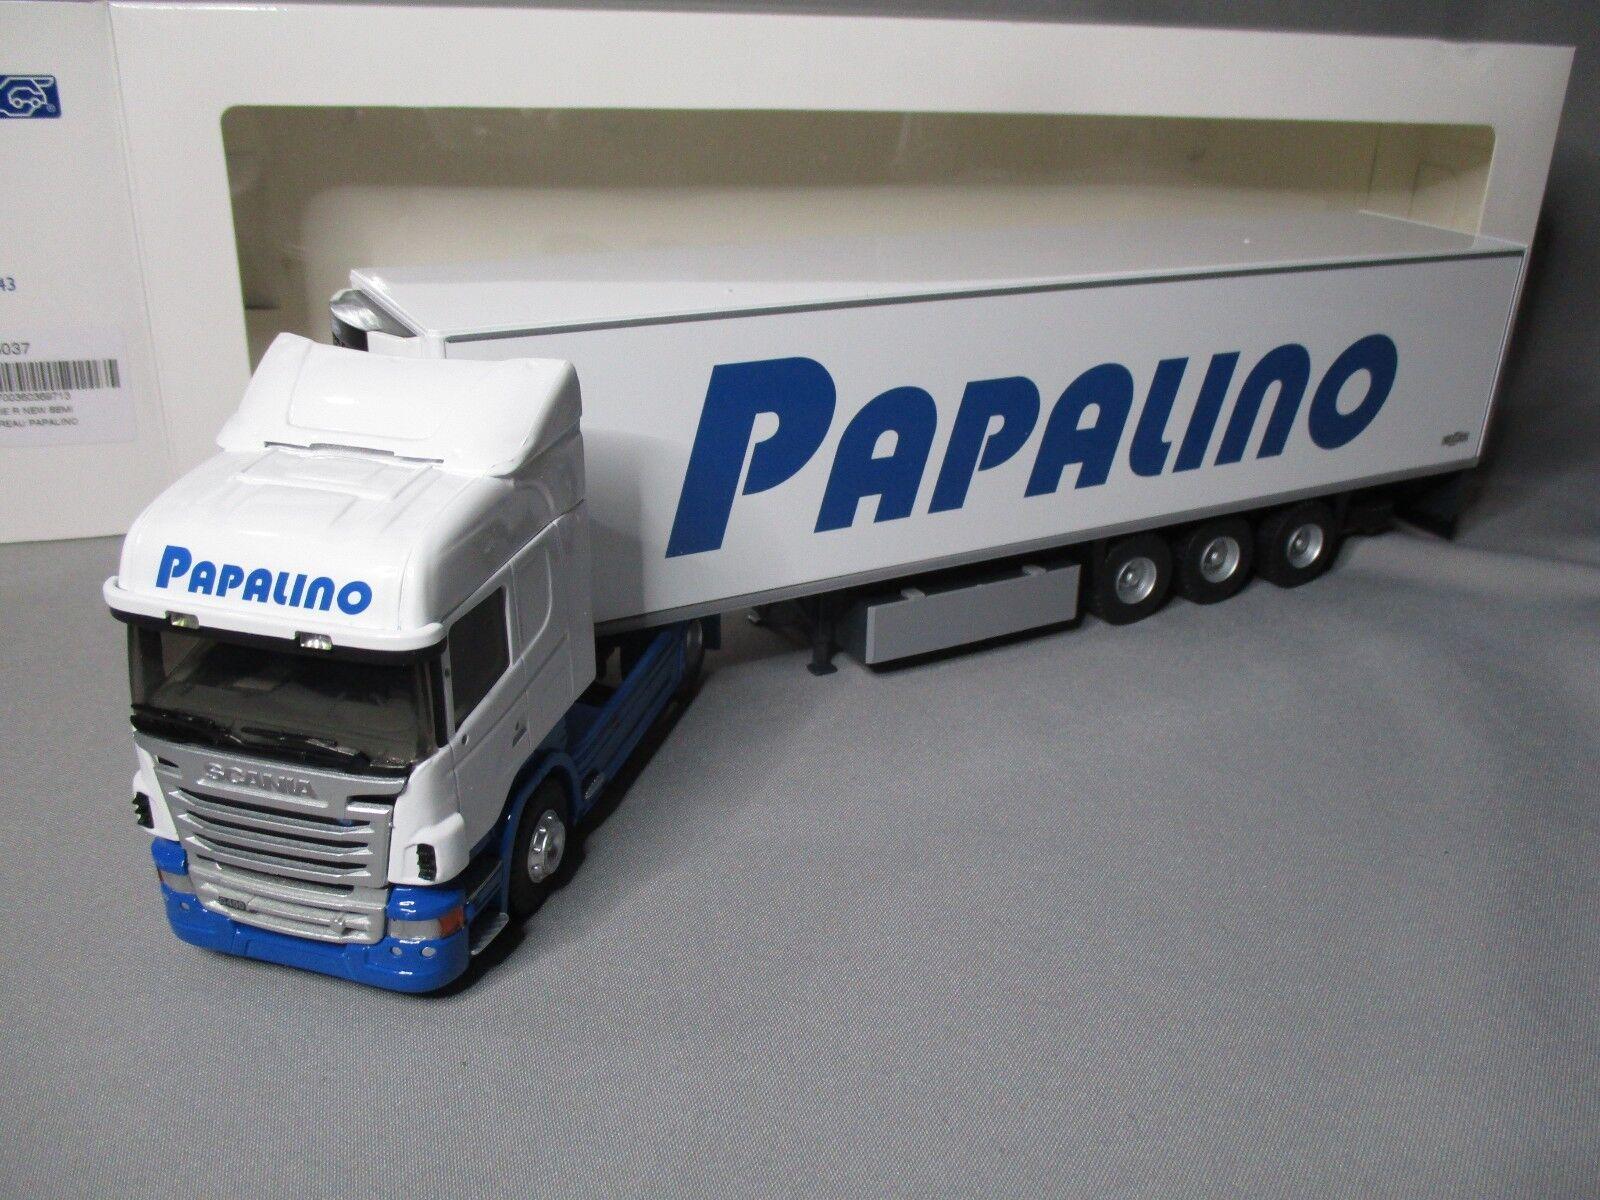 Dv7735 eligor 1 43 scania serie r refrigerated transport papalino 115037 rare